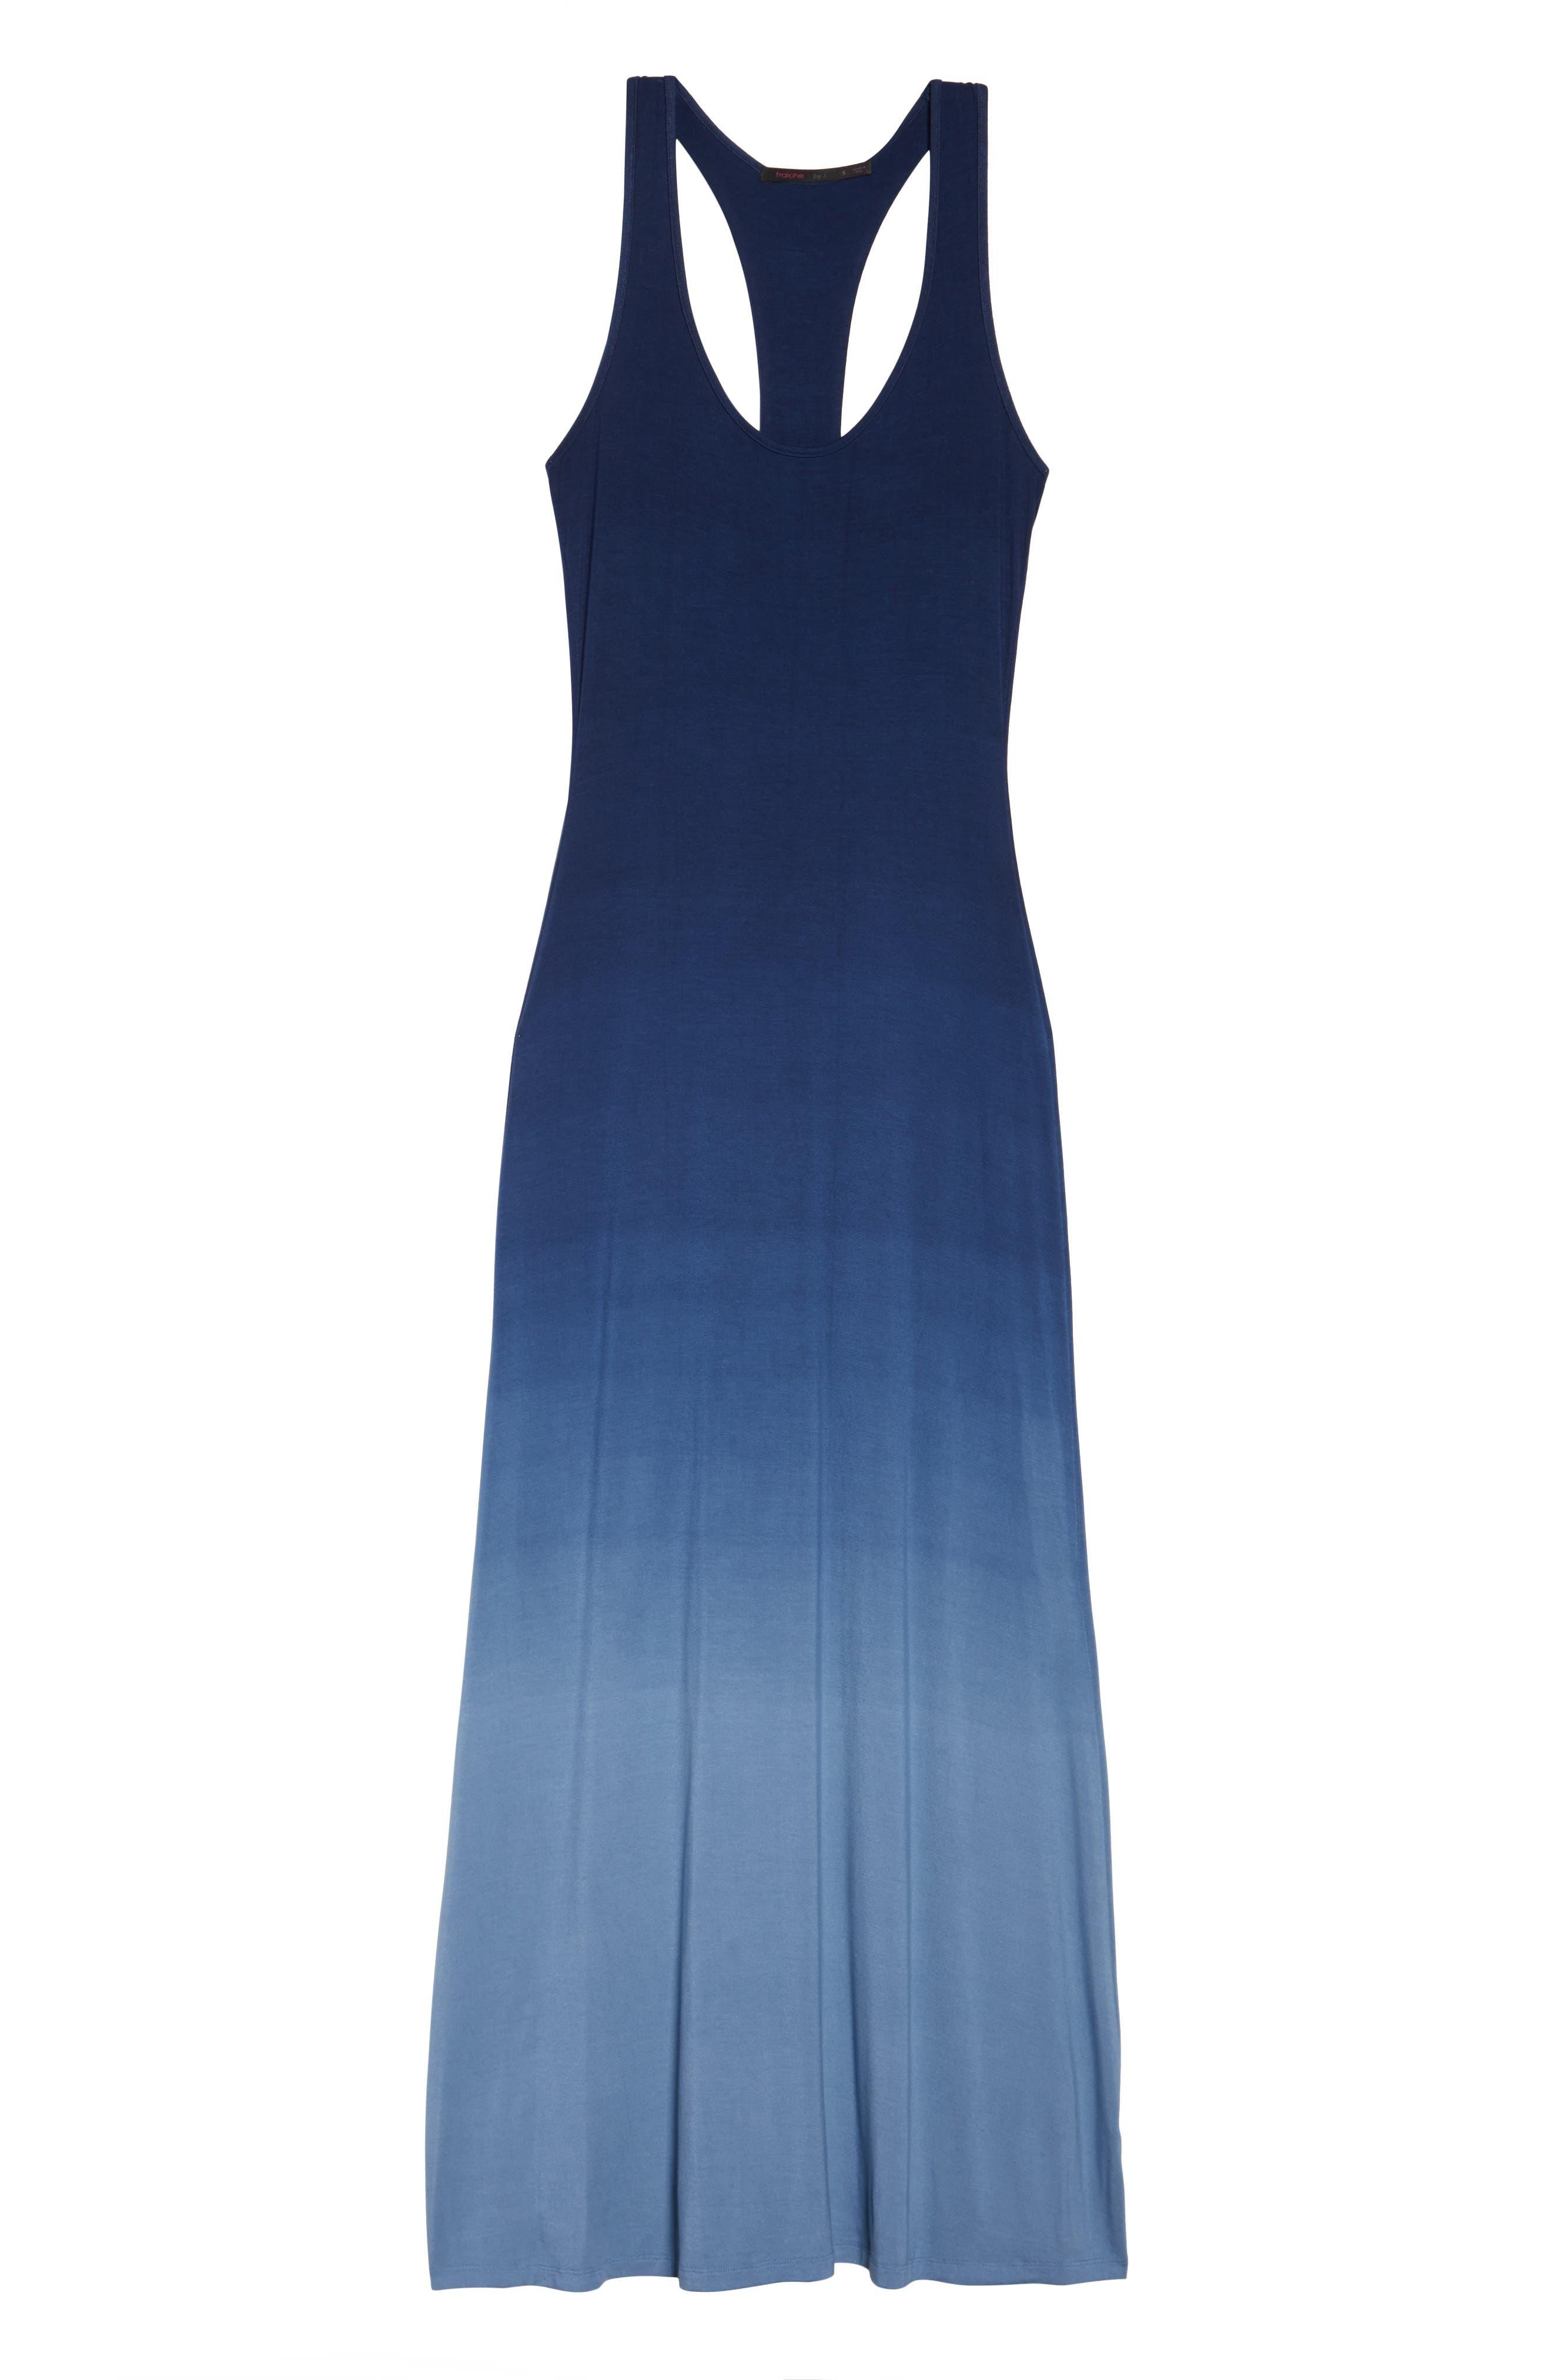 Racerback Maxi Dress,                             Alternate thumbnail 6, color,                             400